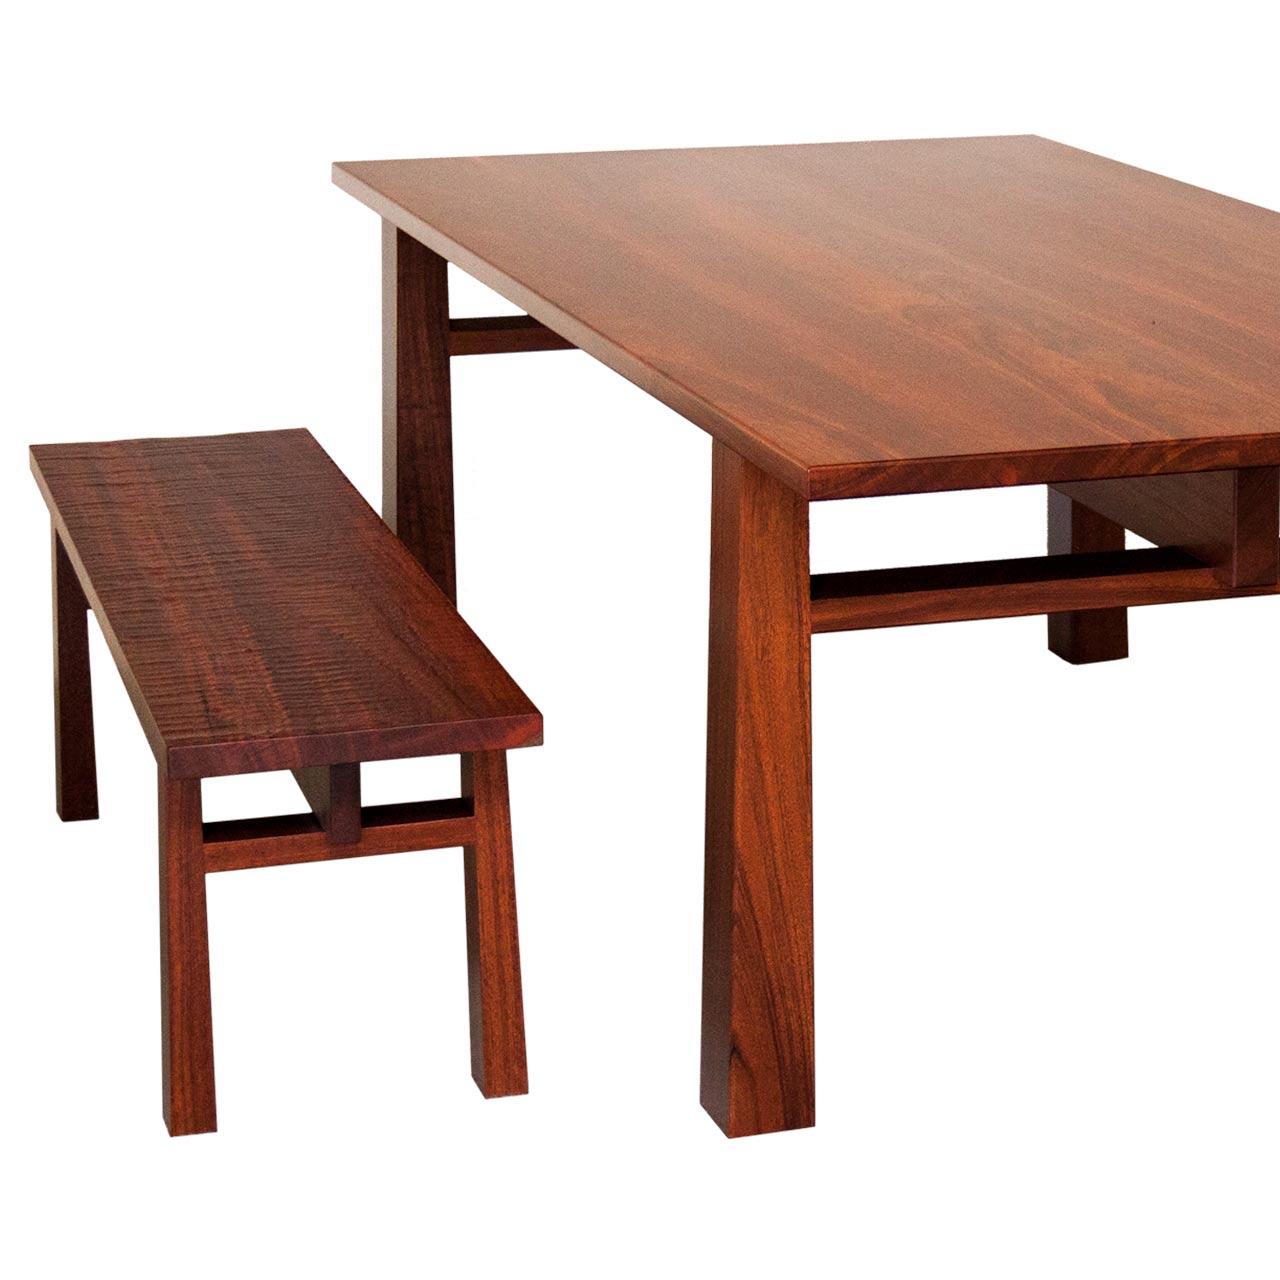 Orientalis Dining Table in Jarrah Treeton Fine Wood Studio : orientalis jarrah dining table descrip from treetonfinewoodstudio.com.au size 1280 x 1280 jpeg 113kB